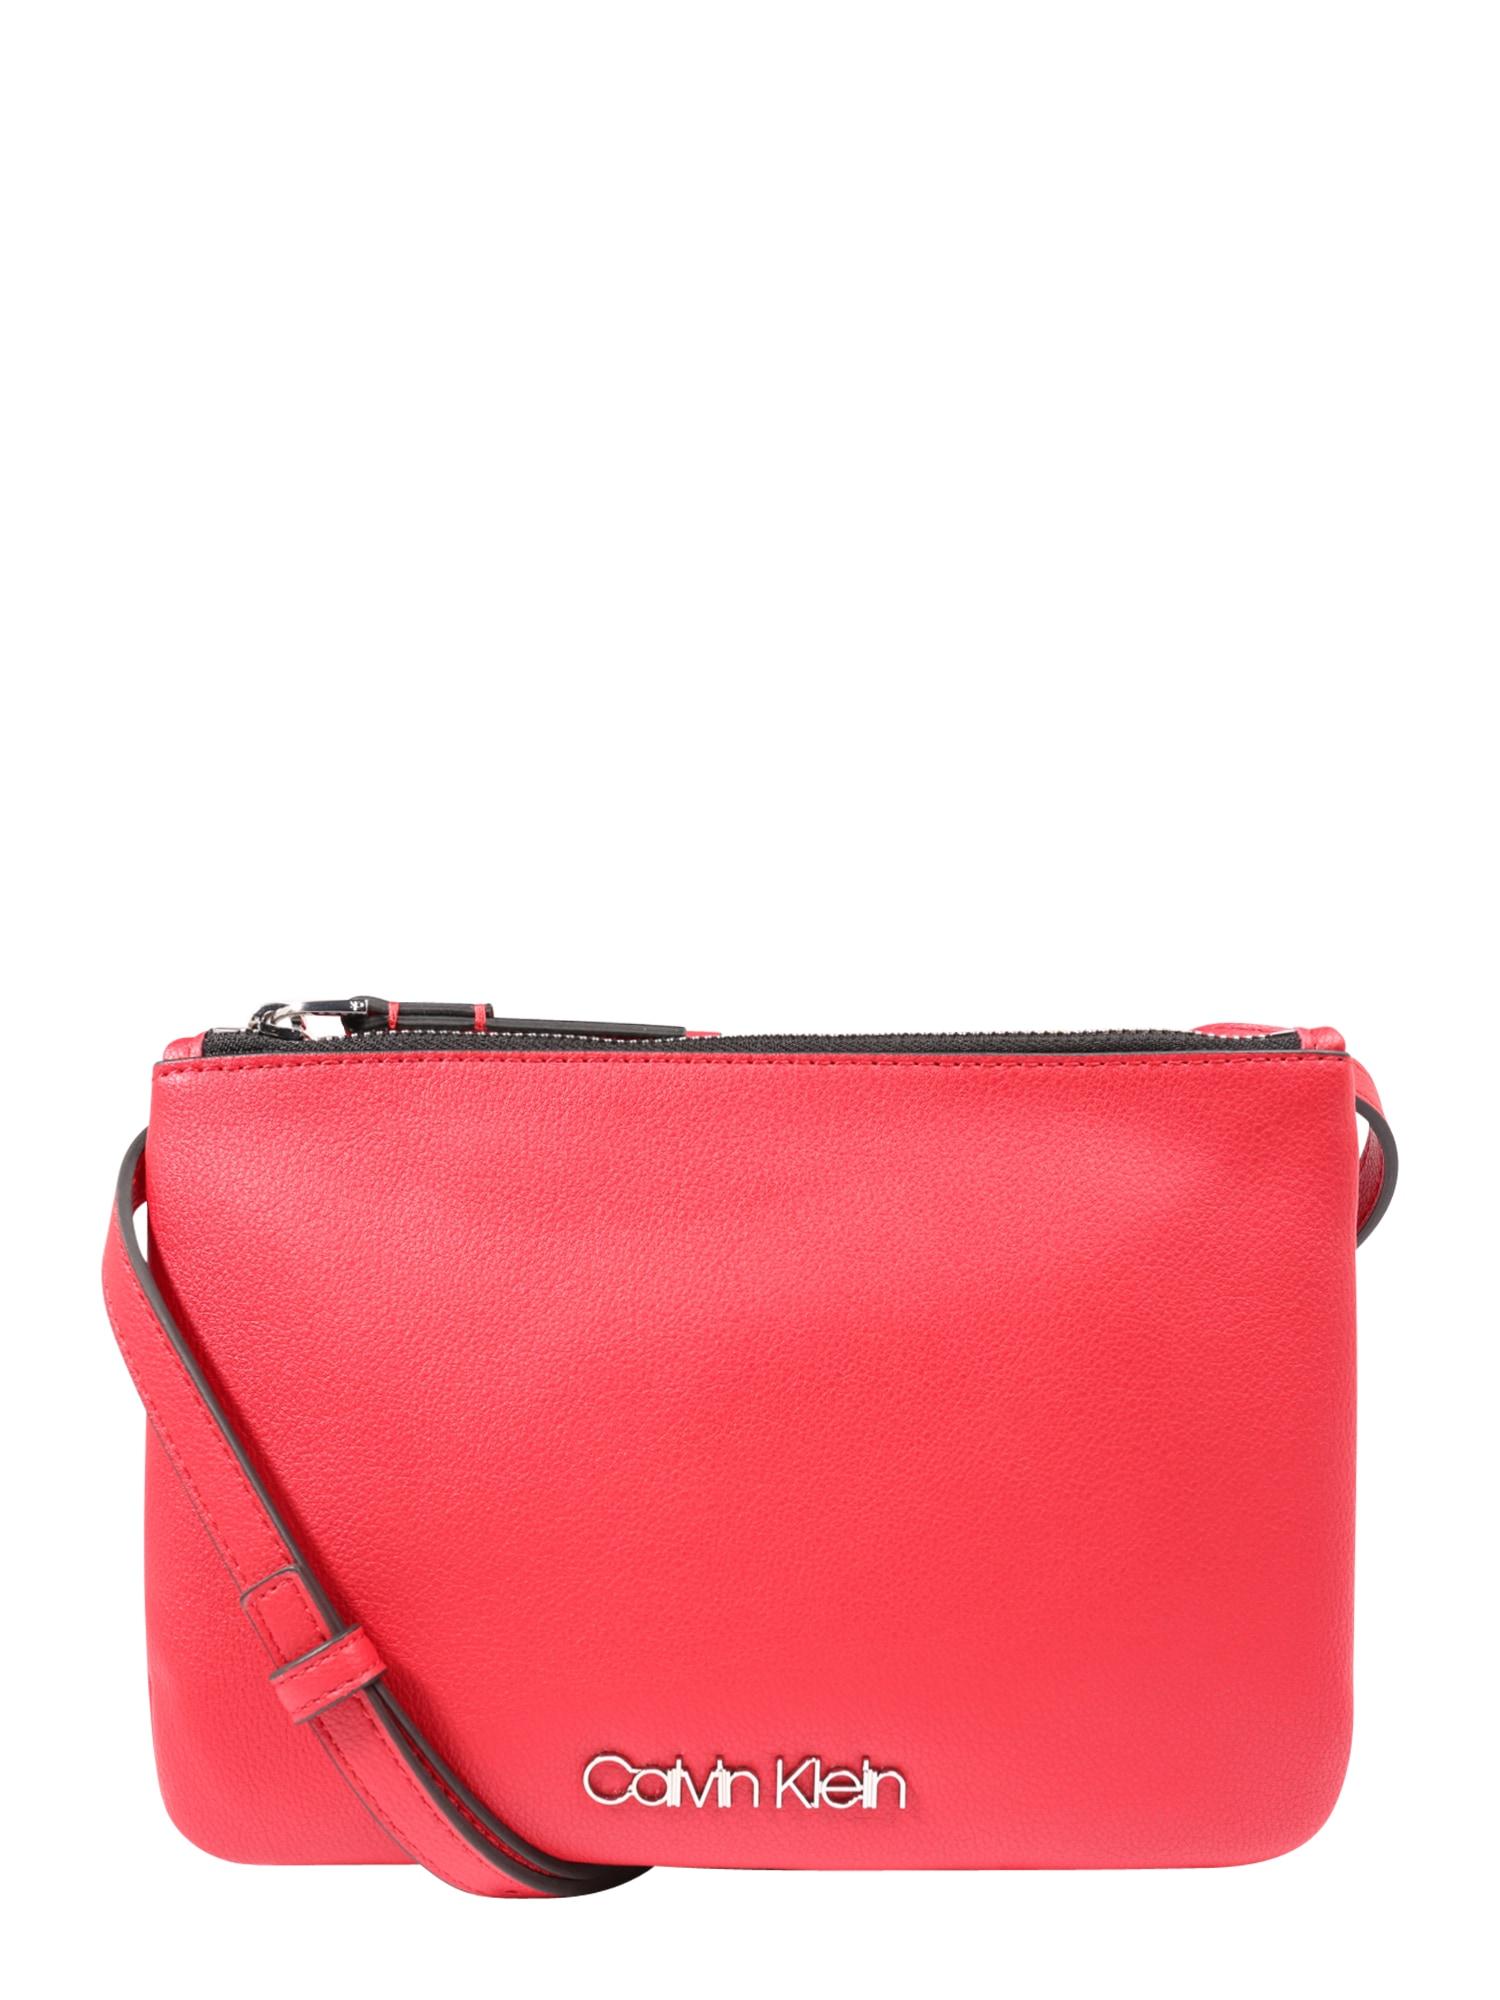 Taška přes rameno CK MUST EW CROSSBODY červená Calvin Klein